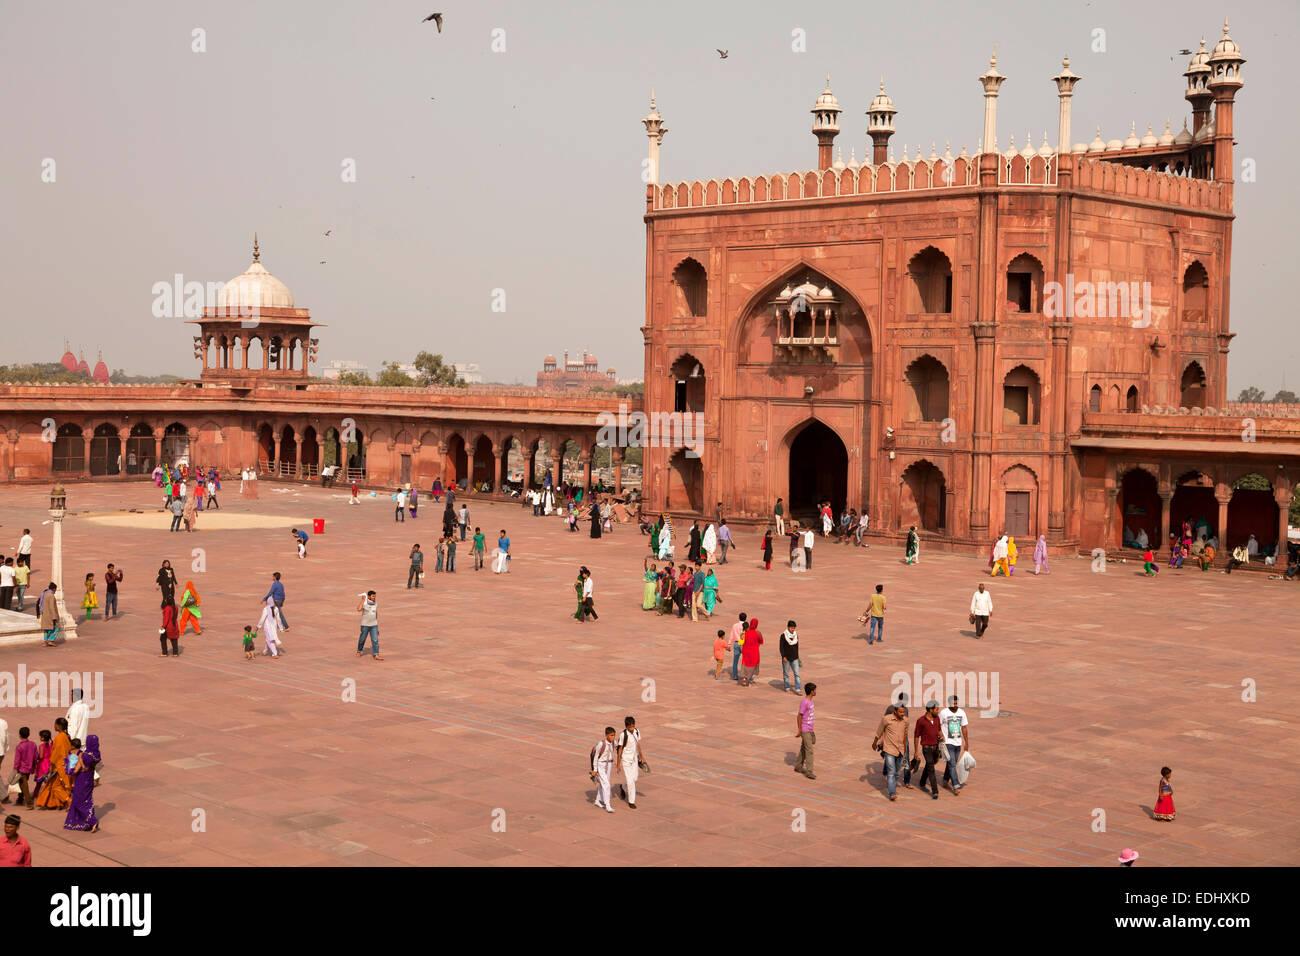 Courtyard of the Friday Mosque Jama Masjid, Delhi, India - Stock Image